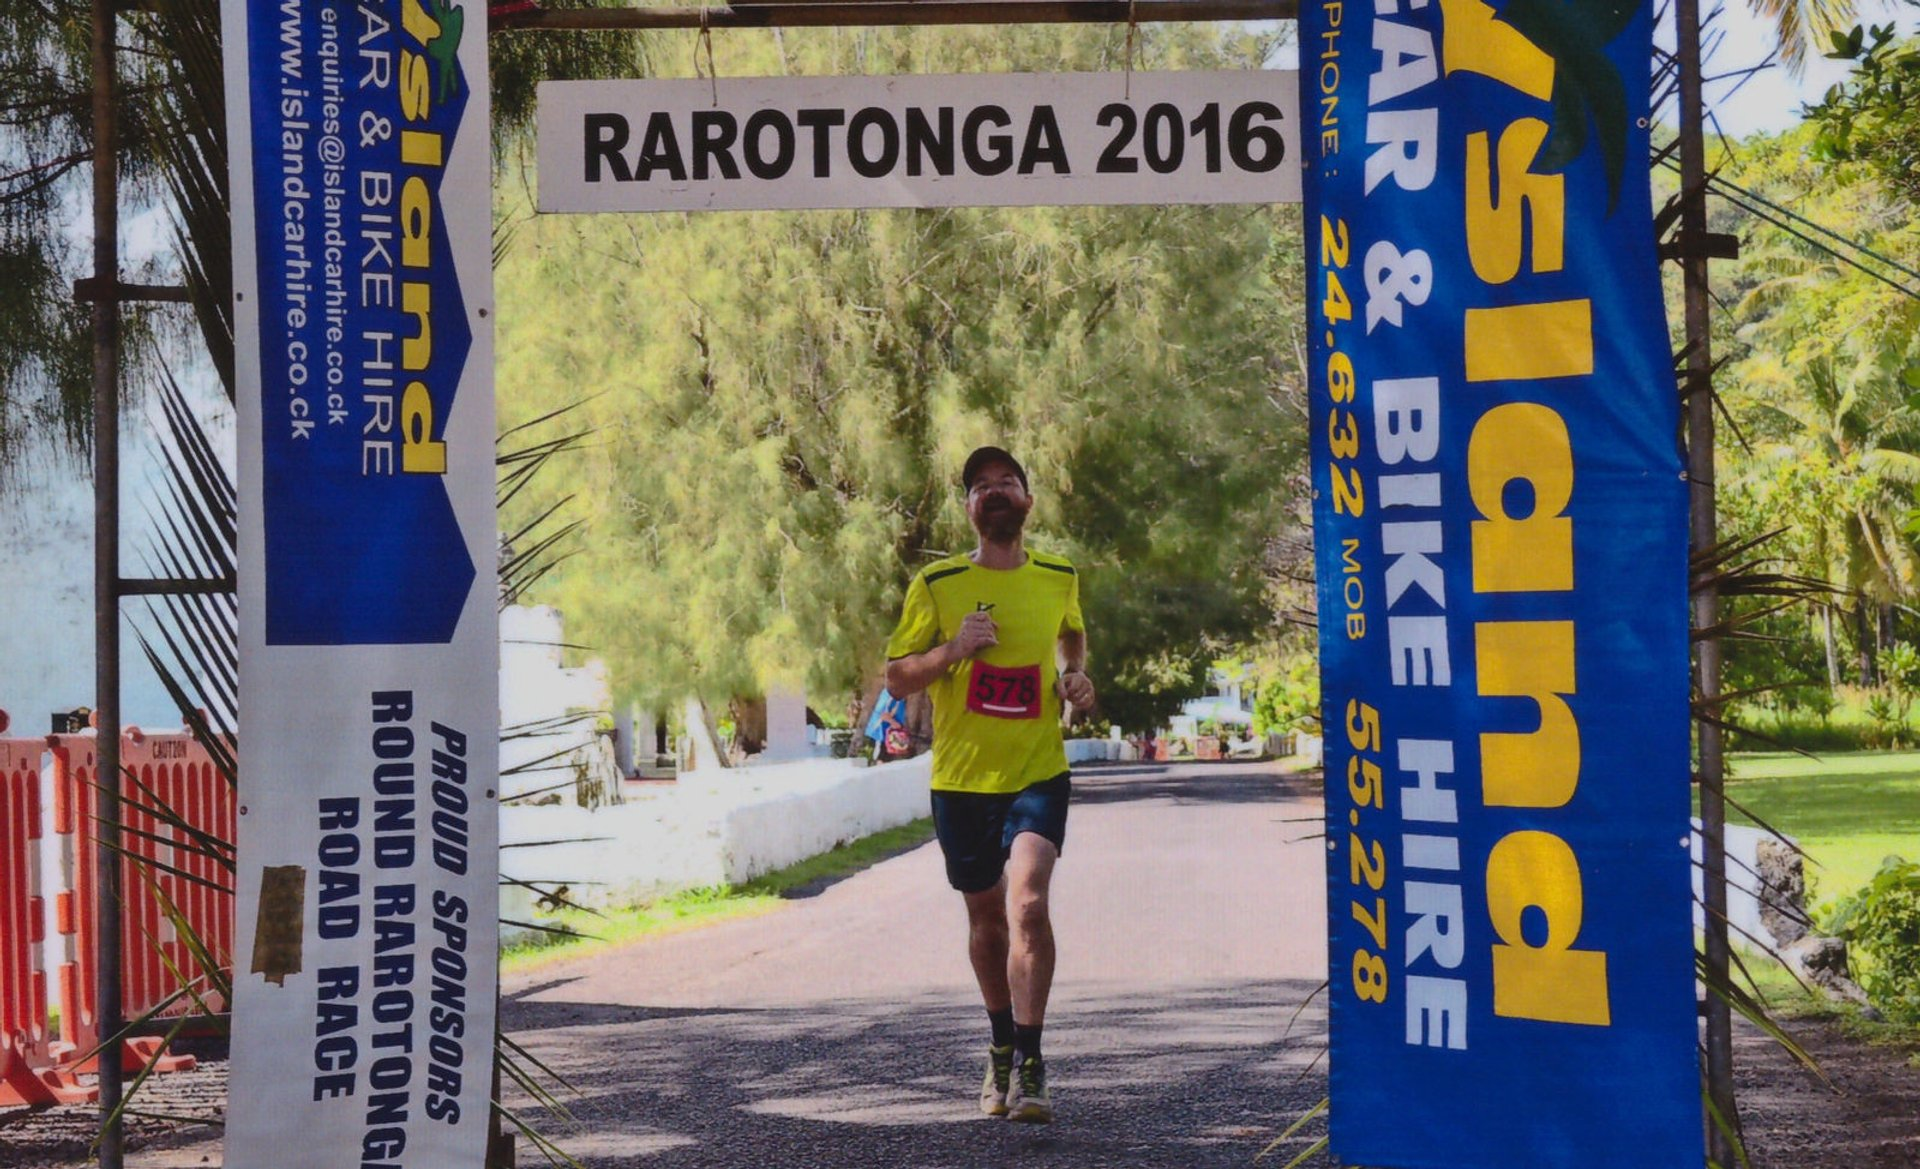 Round Rarotonga Road Race in Rarotonga & Cook Islands - Best Time